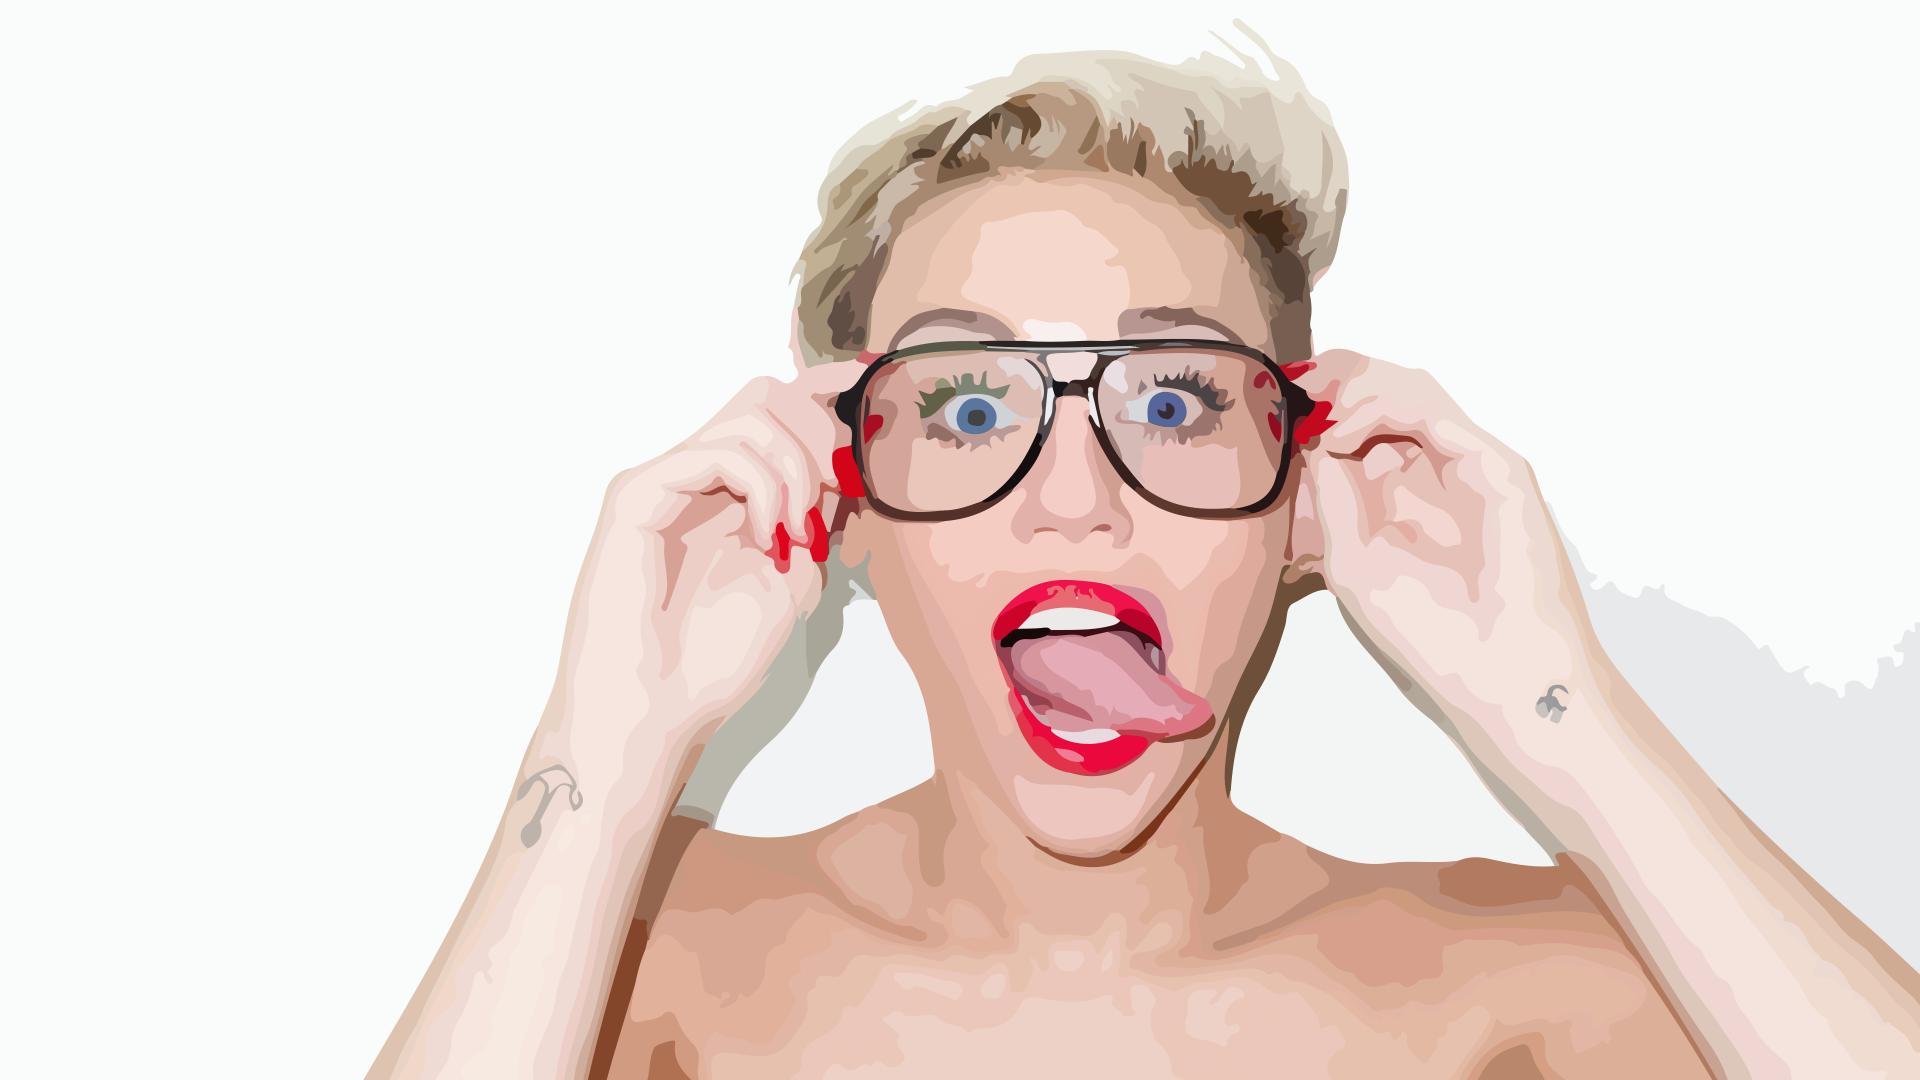 Wallpaper Vector Art Miley Cyrus Lips Tongues Women